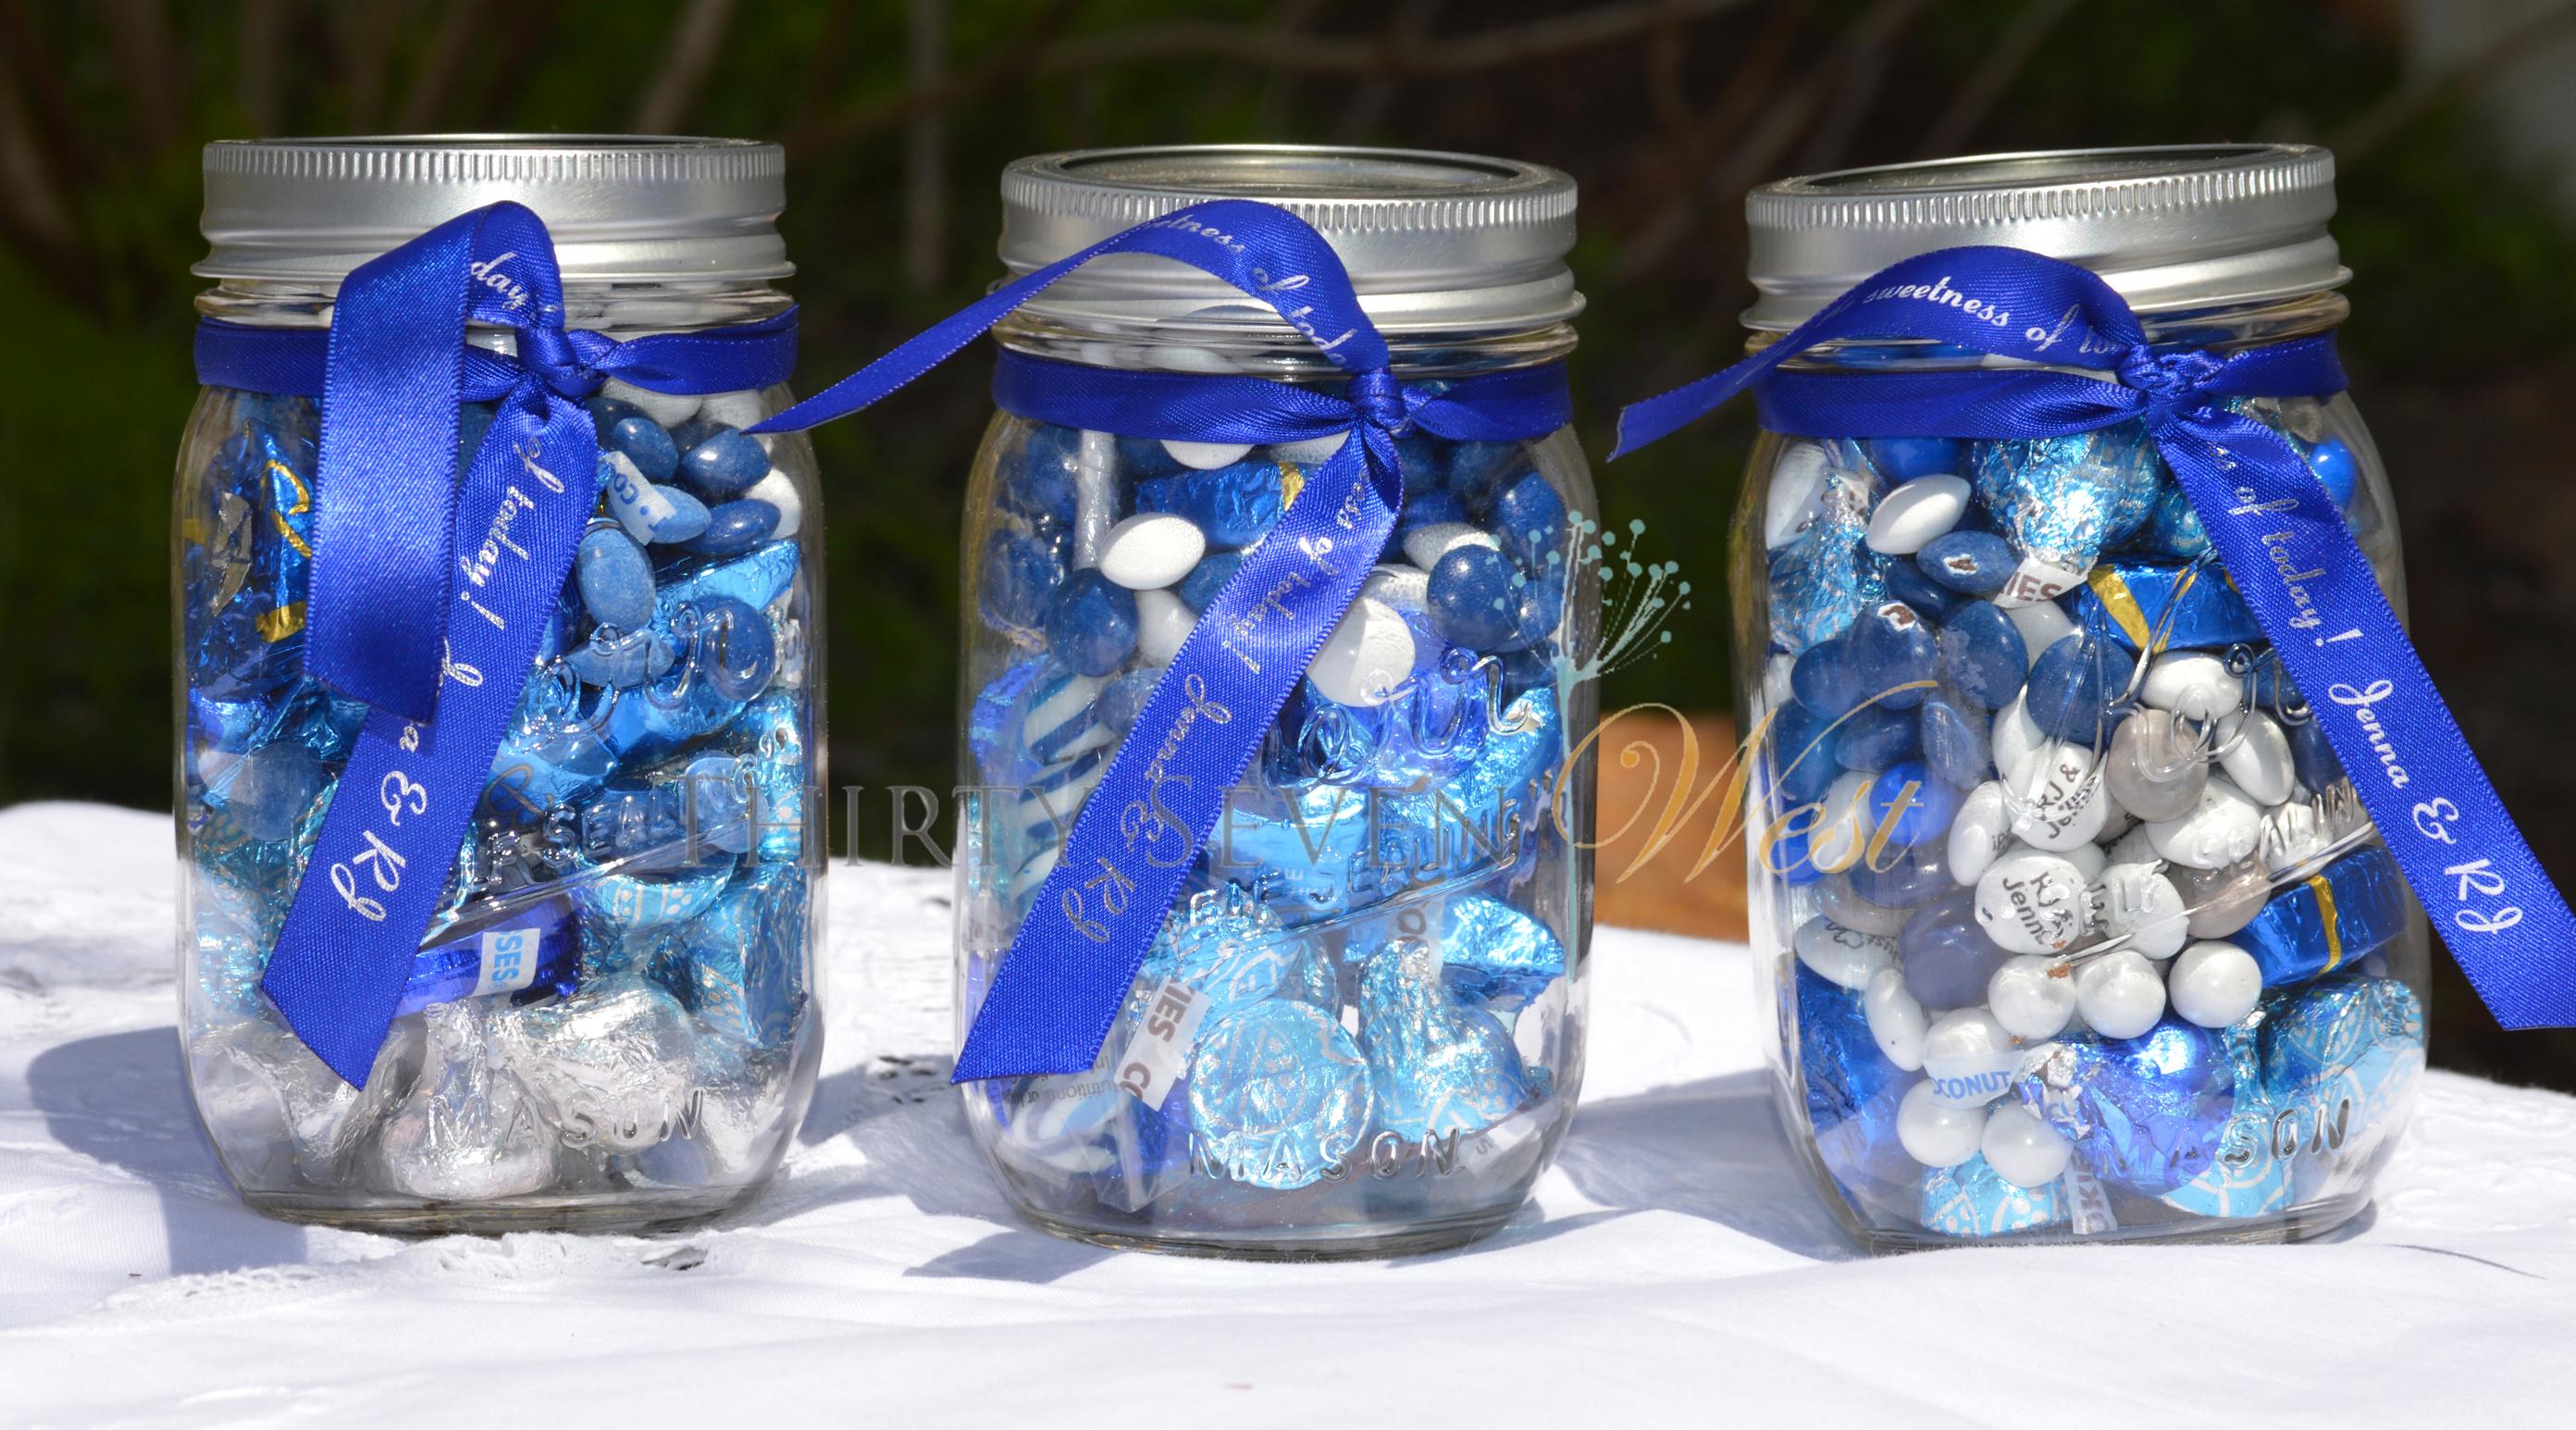 printed-ribbon-on-mason-jars-smaller-cropped-watermarked.jpg